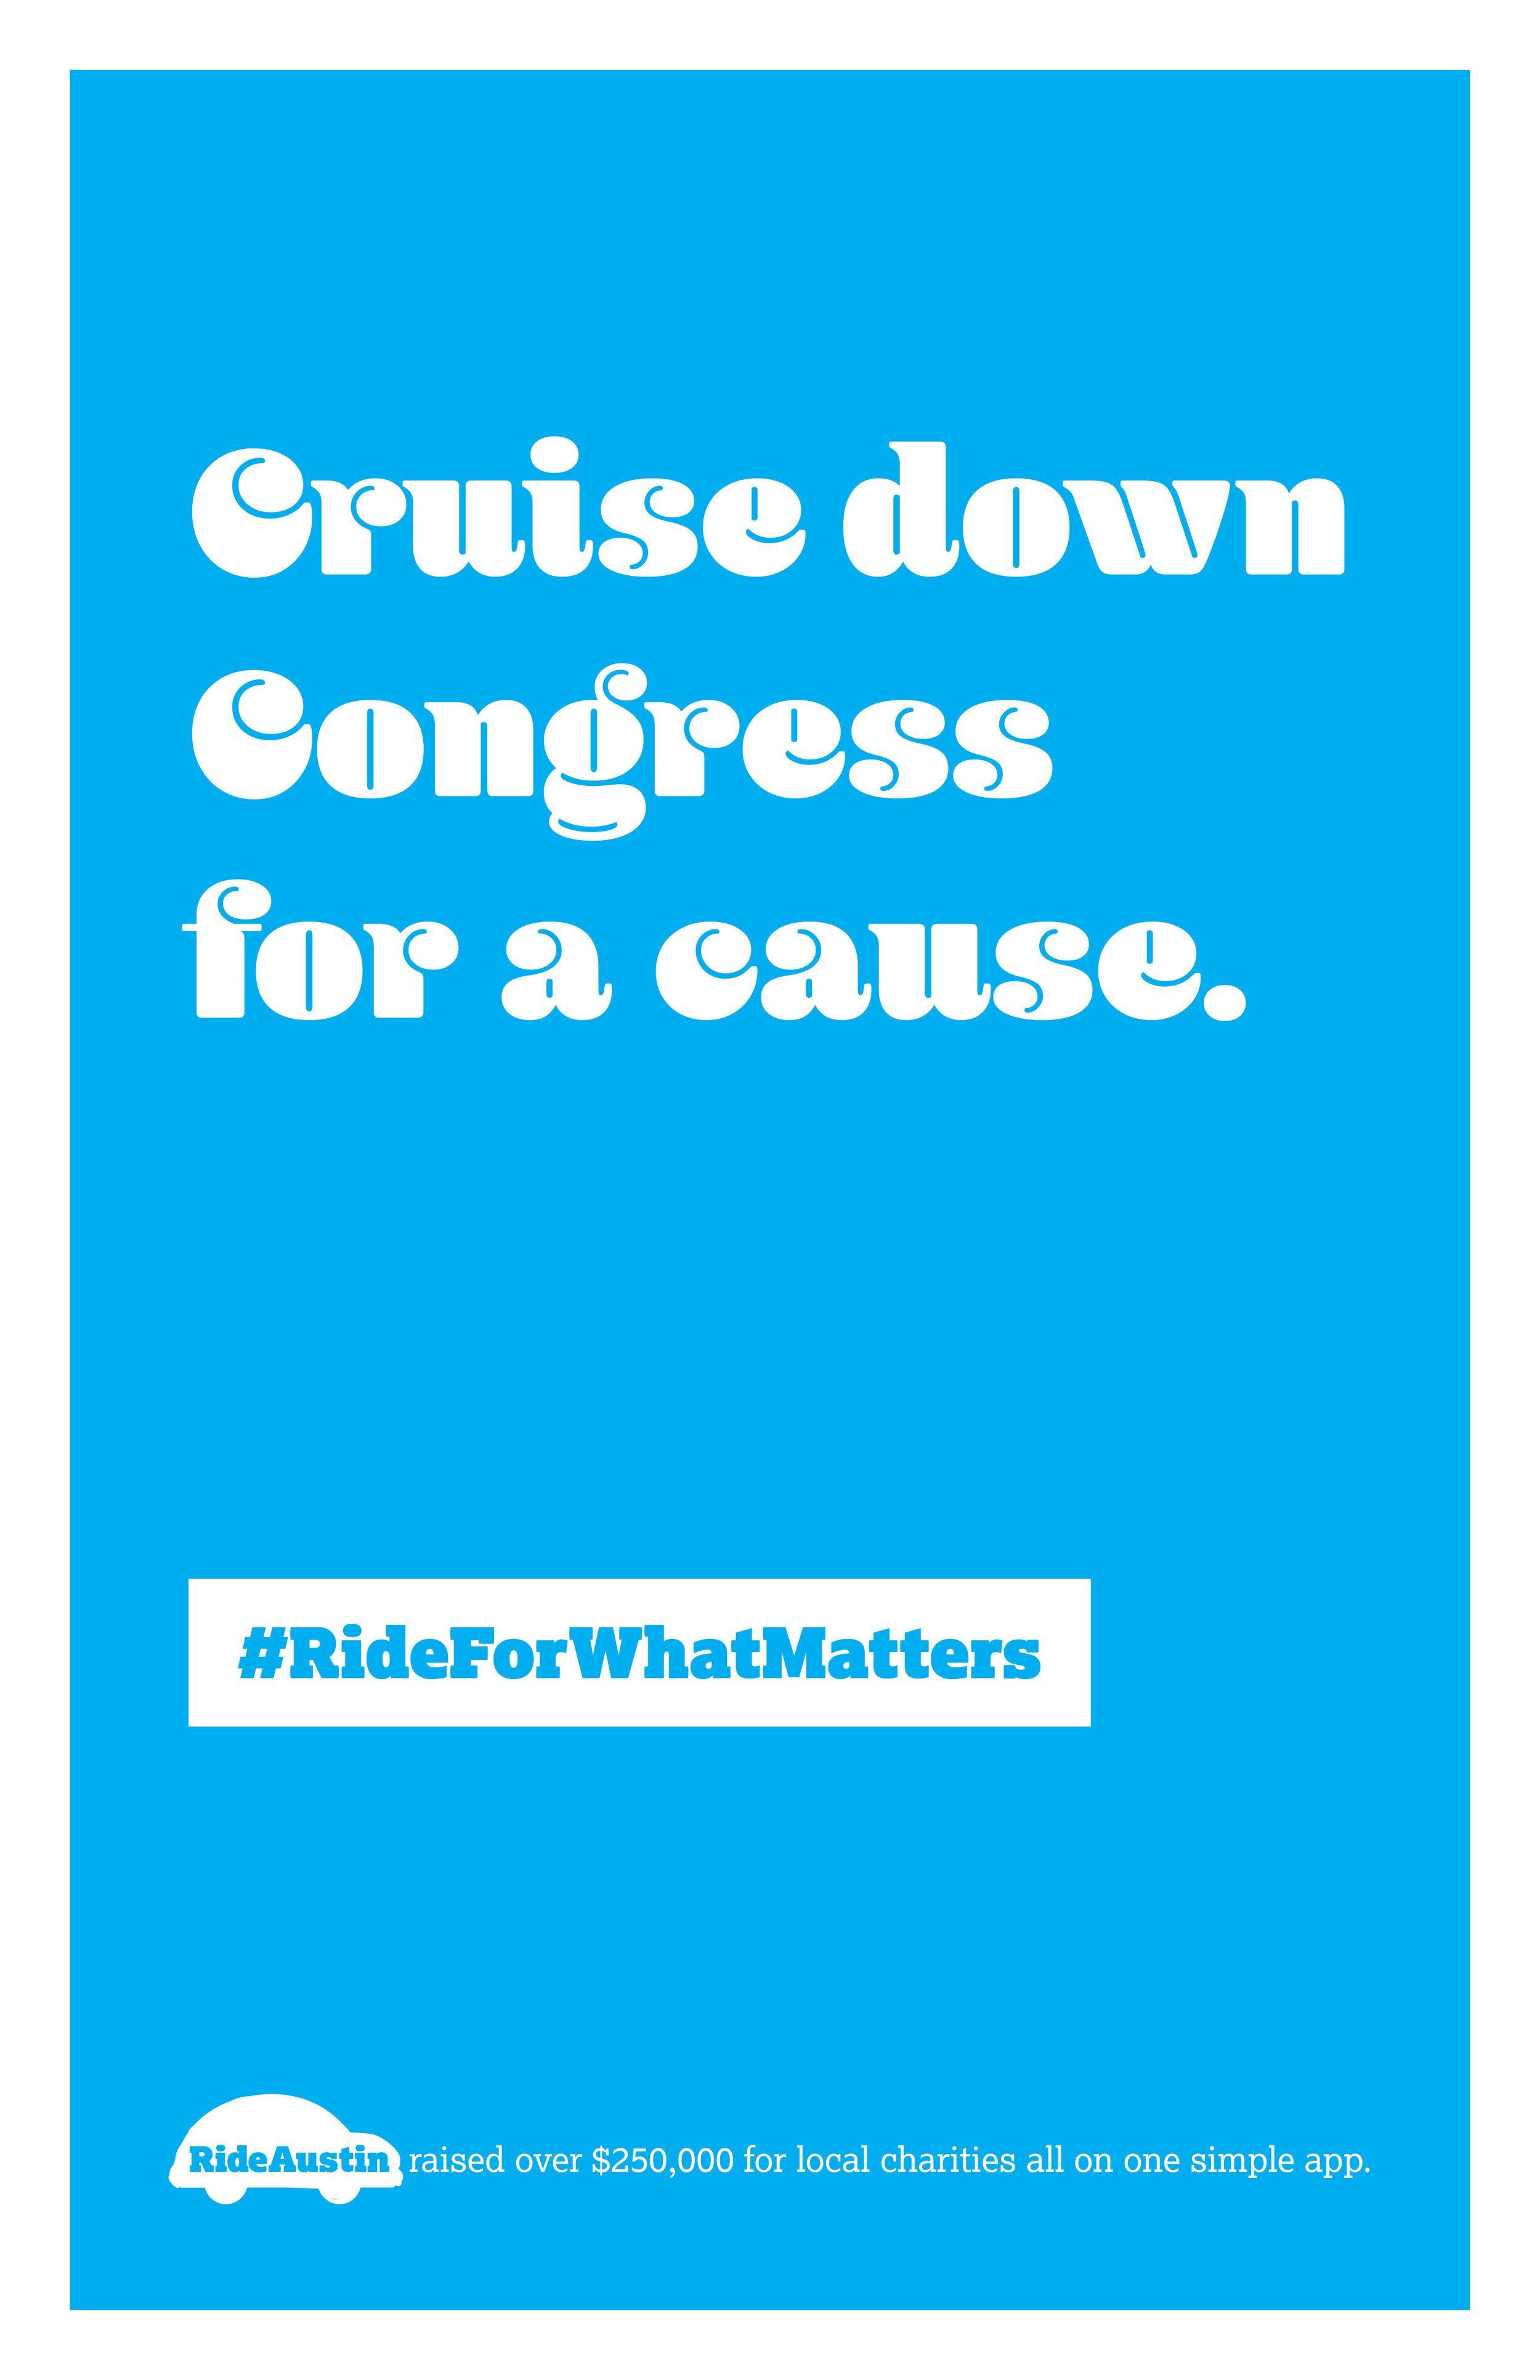 RA-Cruise_Congress.jpg